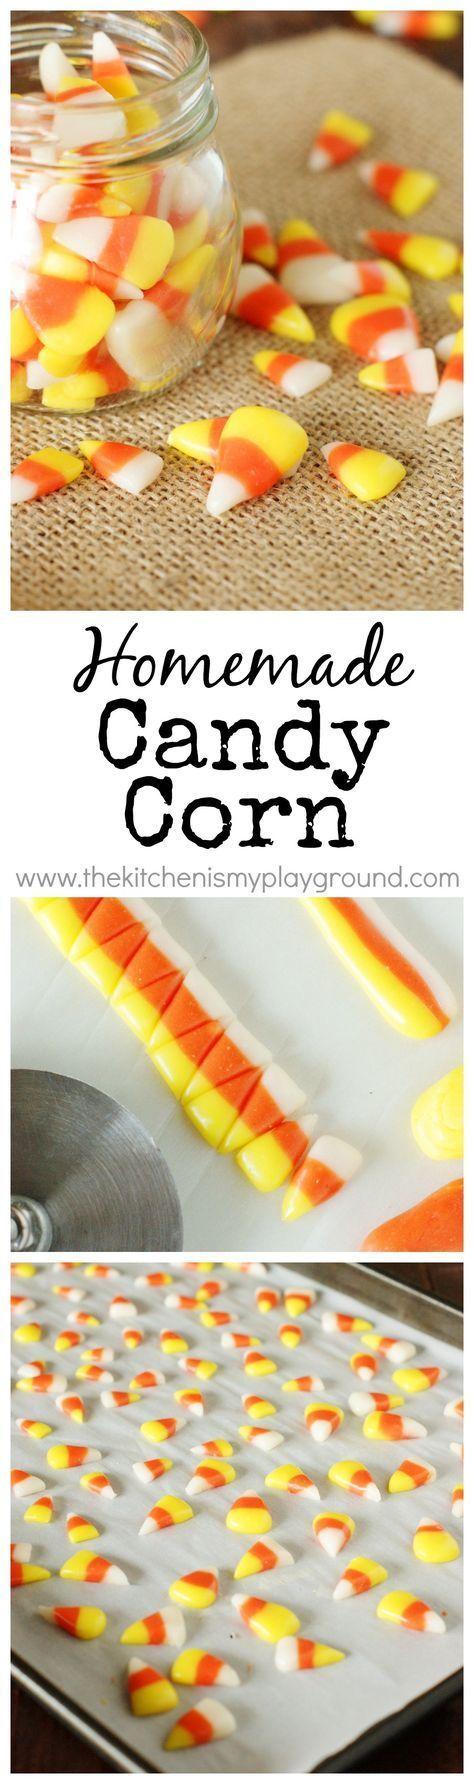 Homemade Candy Corn ~ make your very own homemade version of this iconic Halloween treat. www.thekitchenismyplayground.com